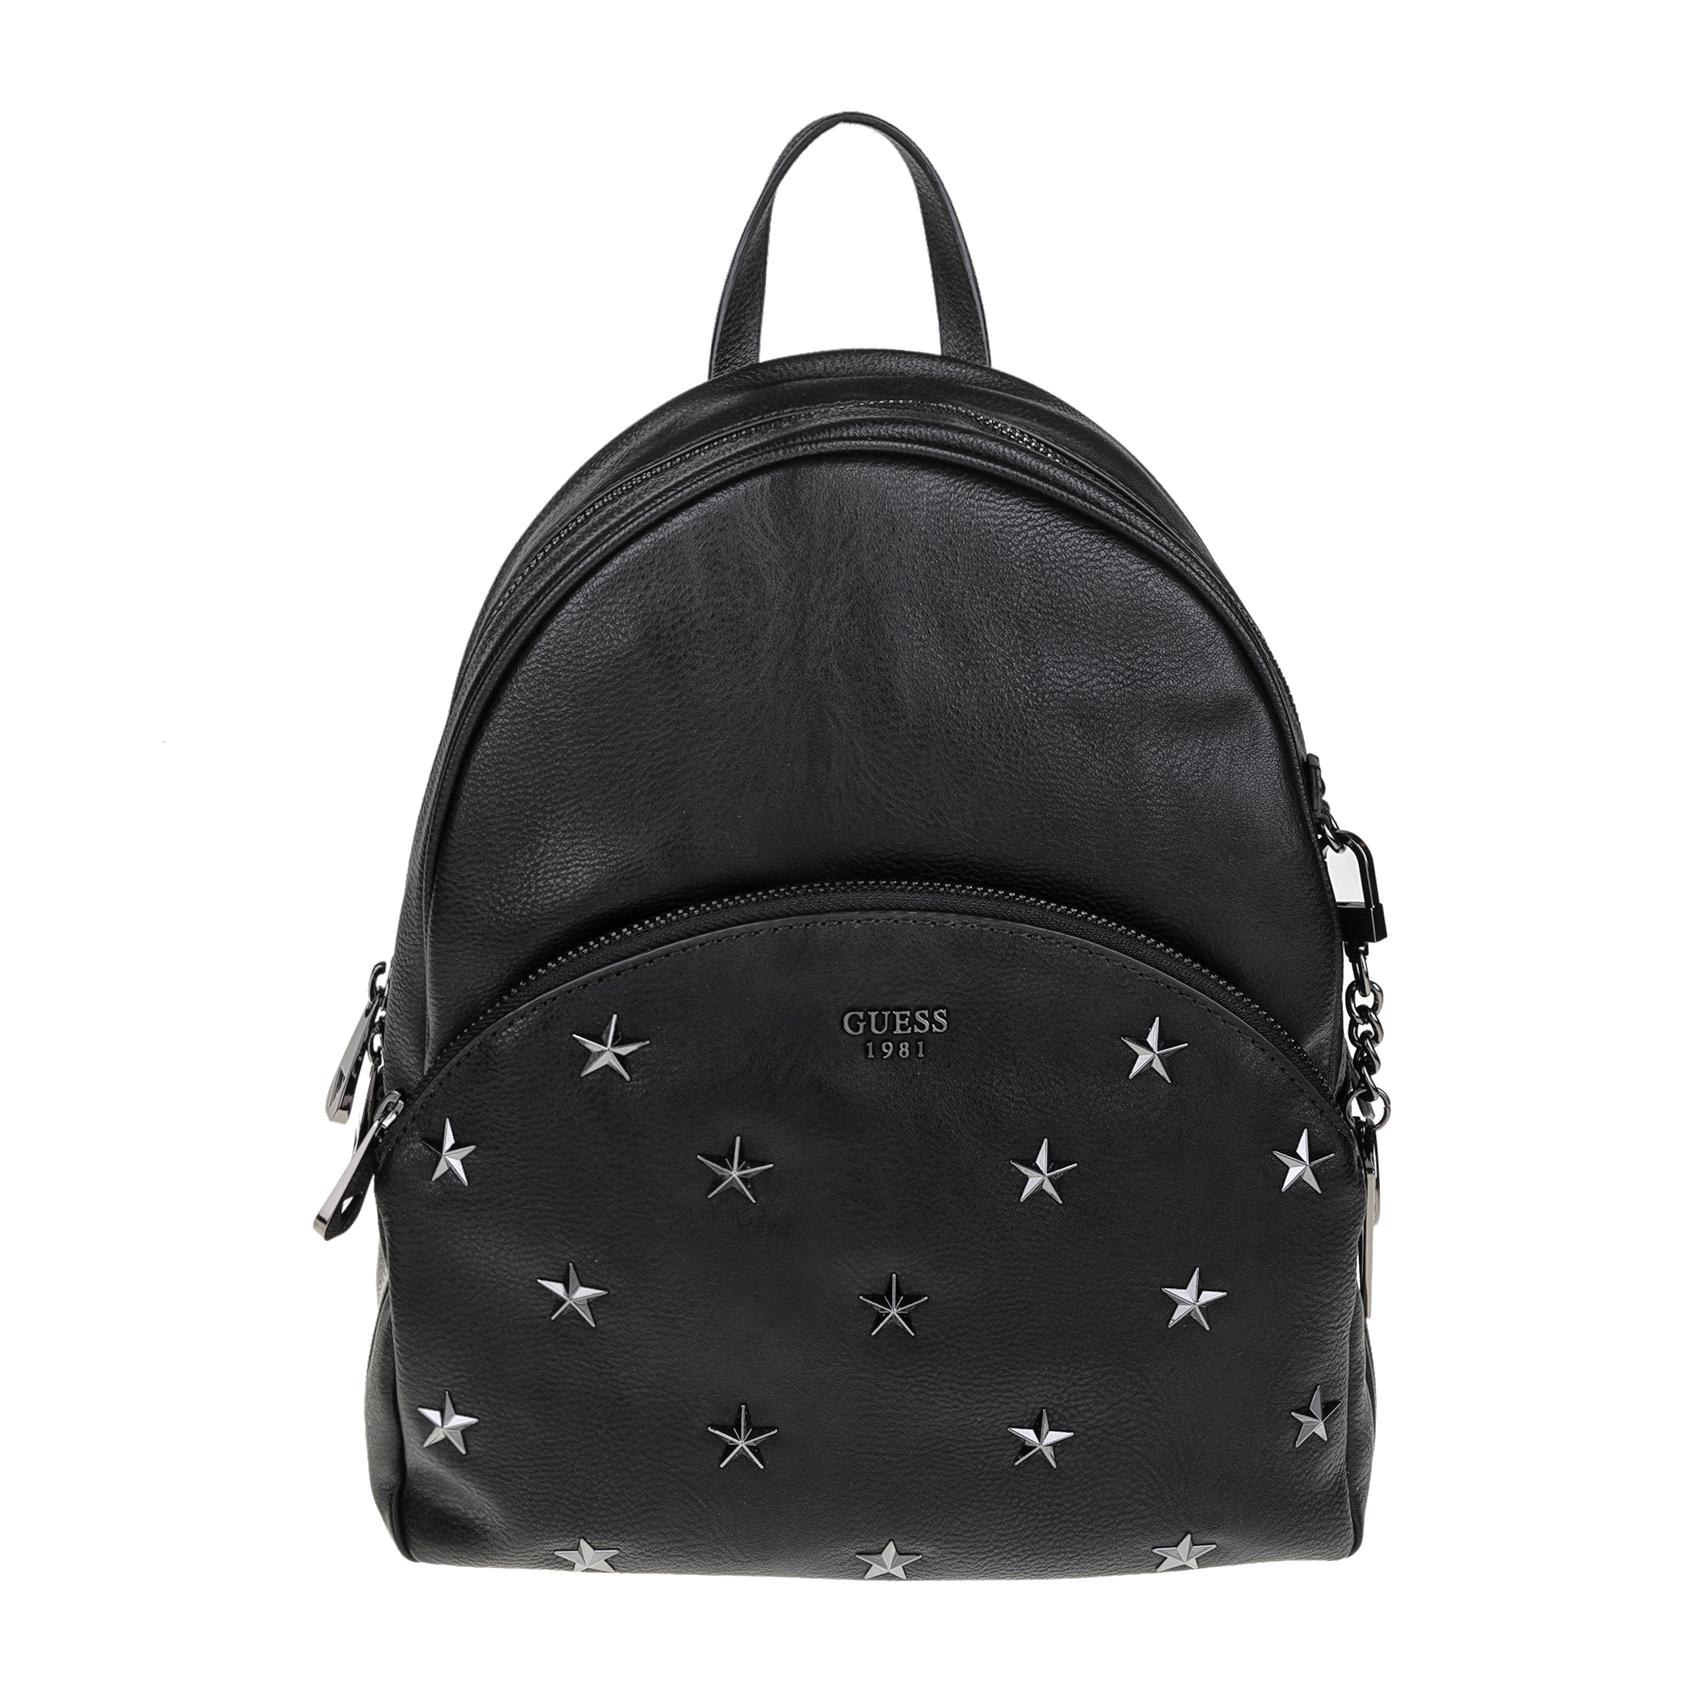 GUESS – Γυναικεία τσάντα πλάτης GUESS BRADYN μαύρη